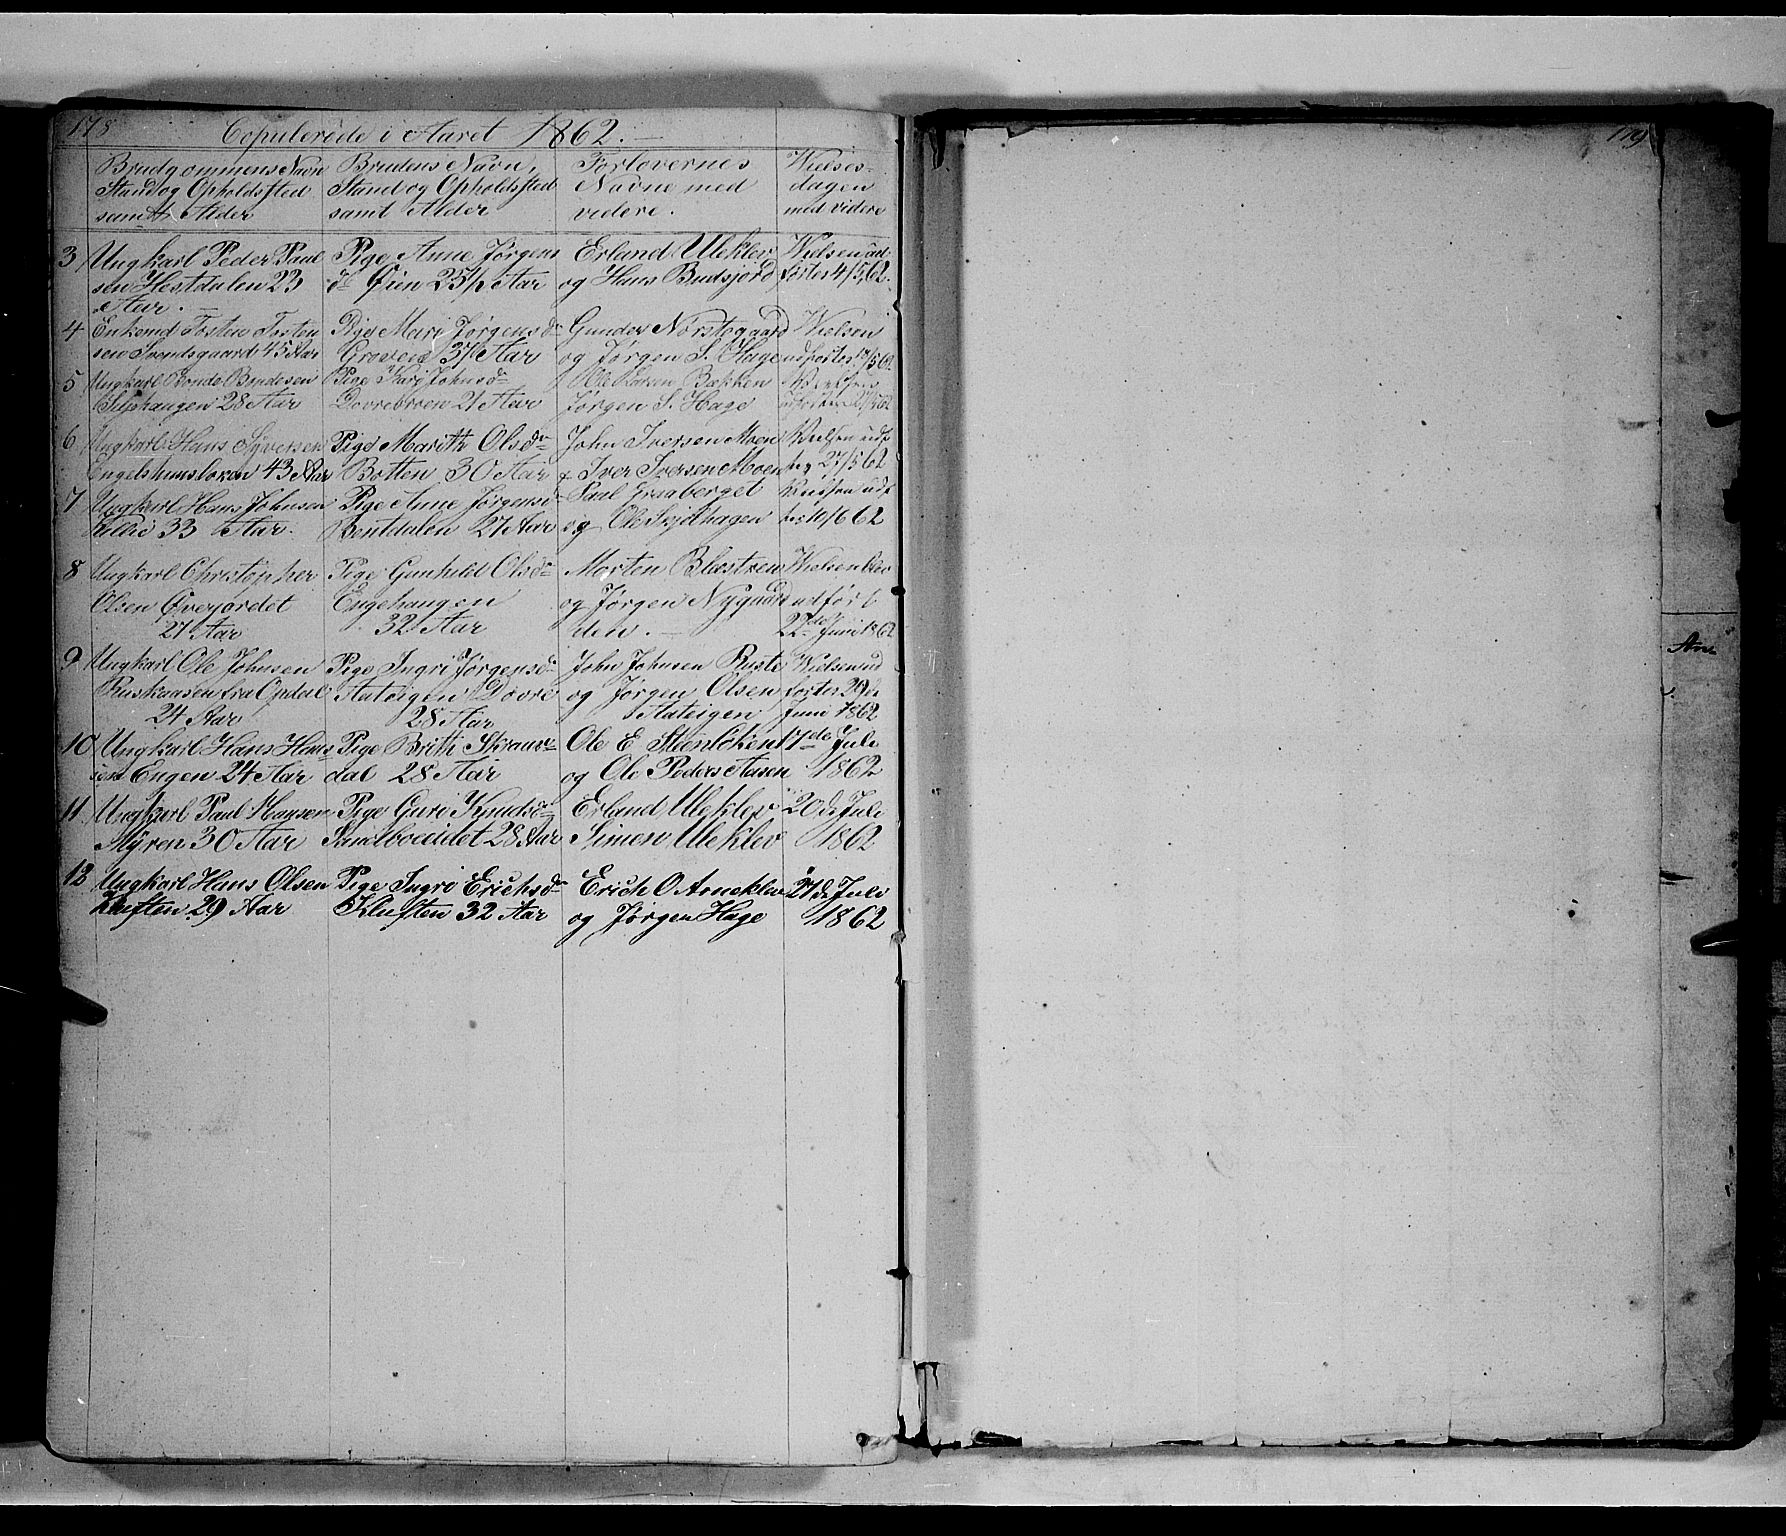 SAH, Lesja prestekontor, Klokkerbok nr. 3, 1842-1862, s. 278-279